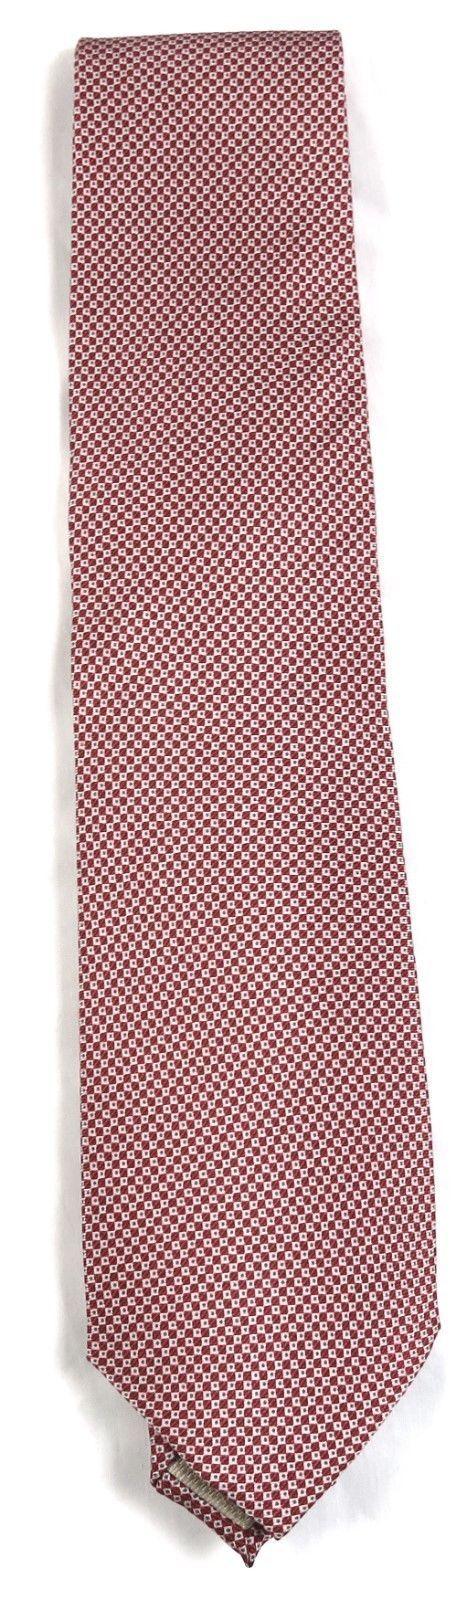 Tommy Bahama Men's Tie Classic Necktie 100% Silk Licensed Island Hop Red